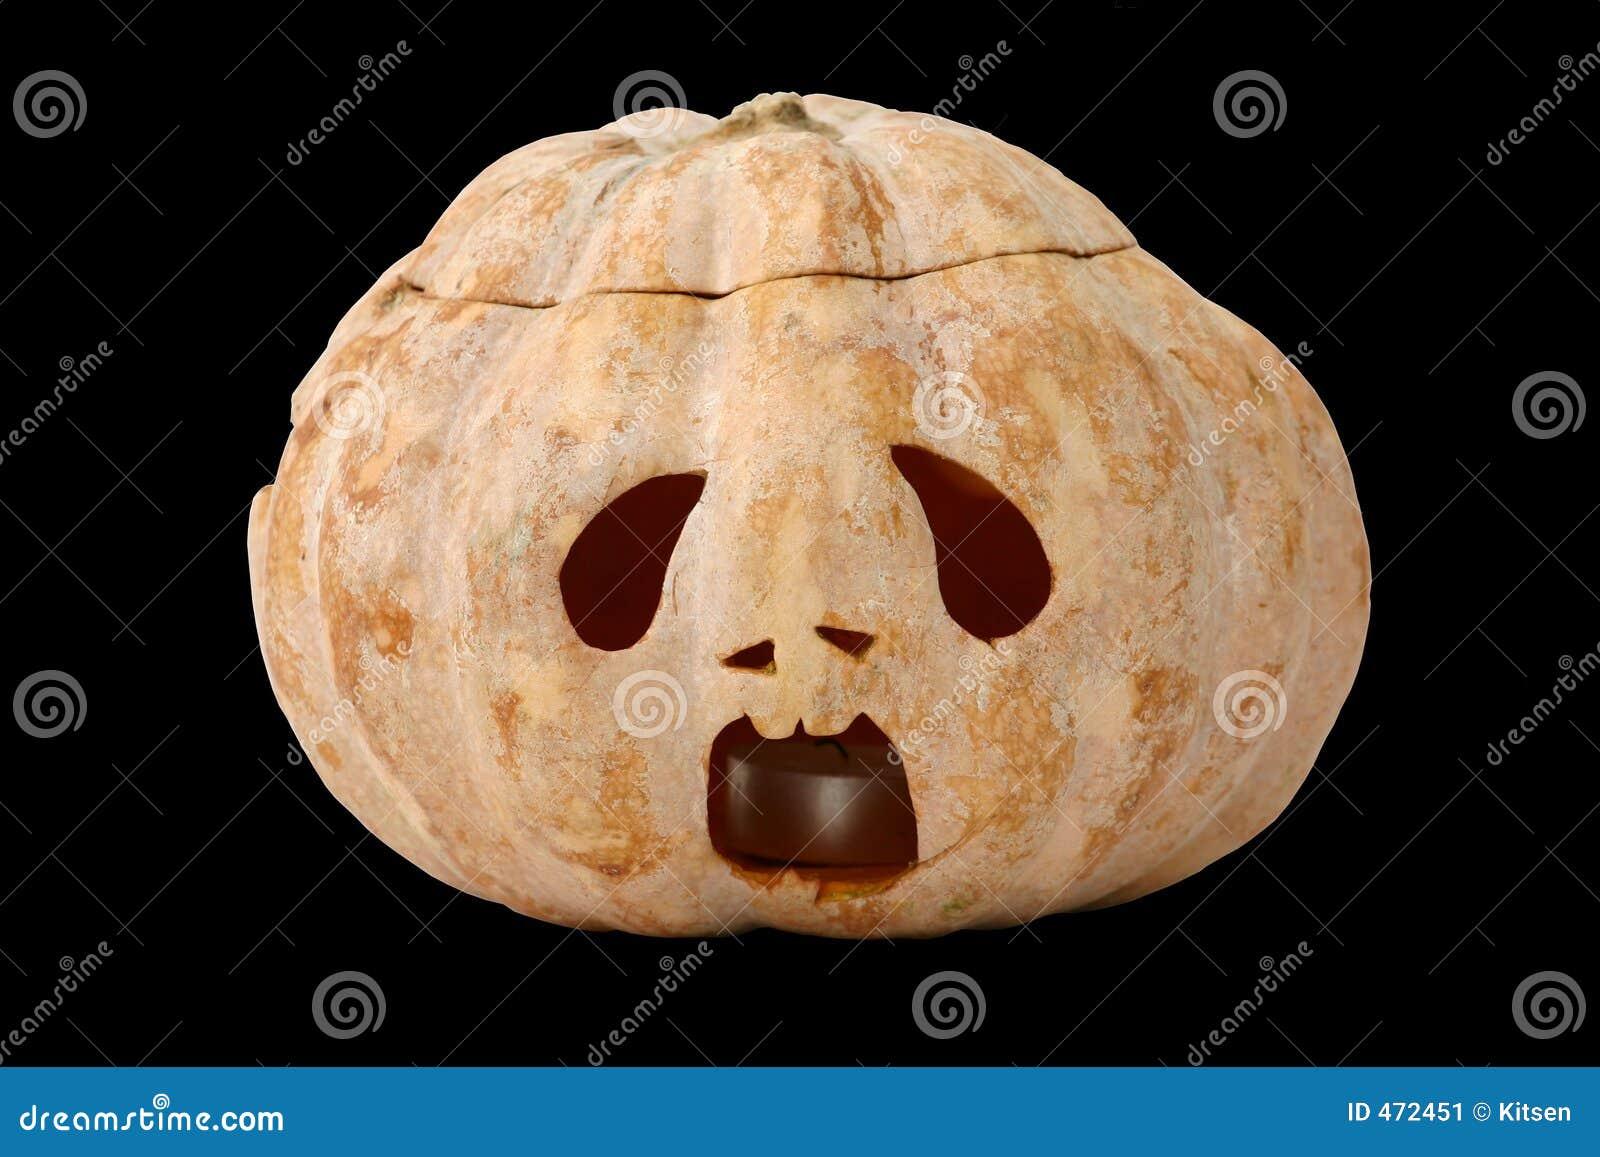 Download Jack-o-lantern stock image. Image of harvest, nourishment - 472451